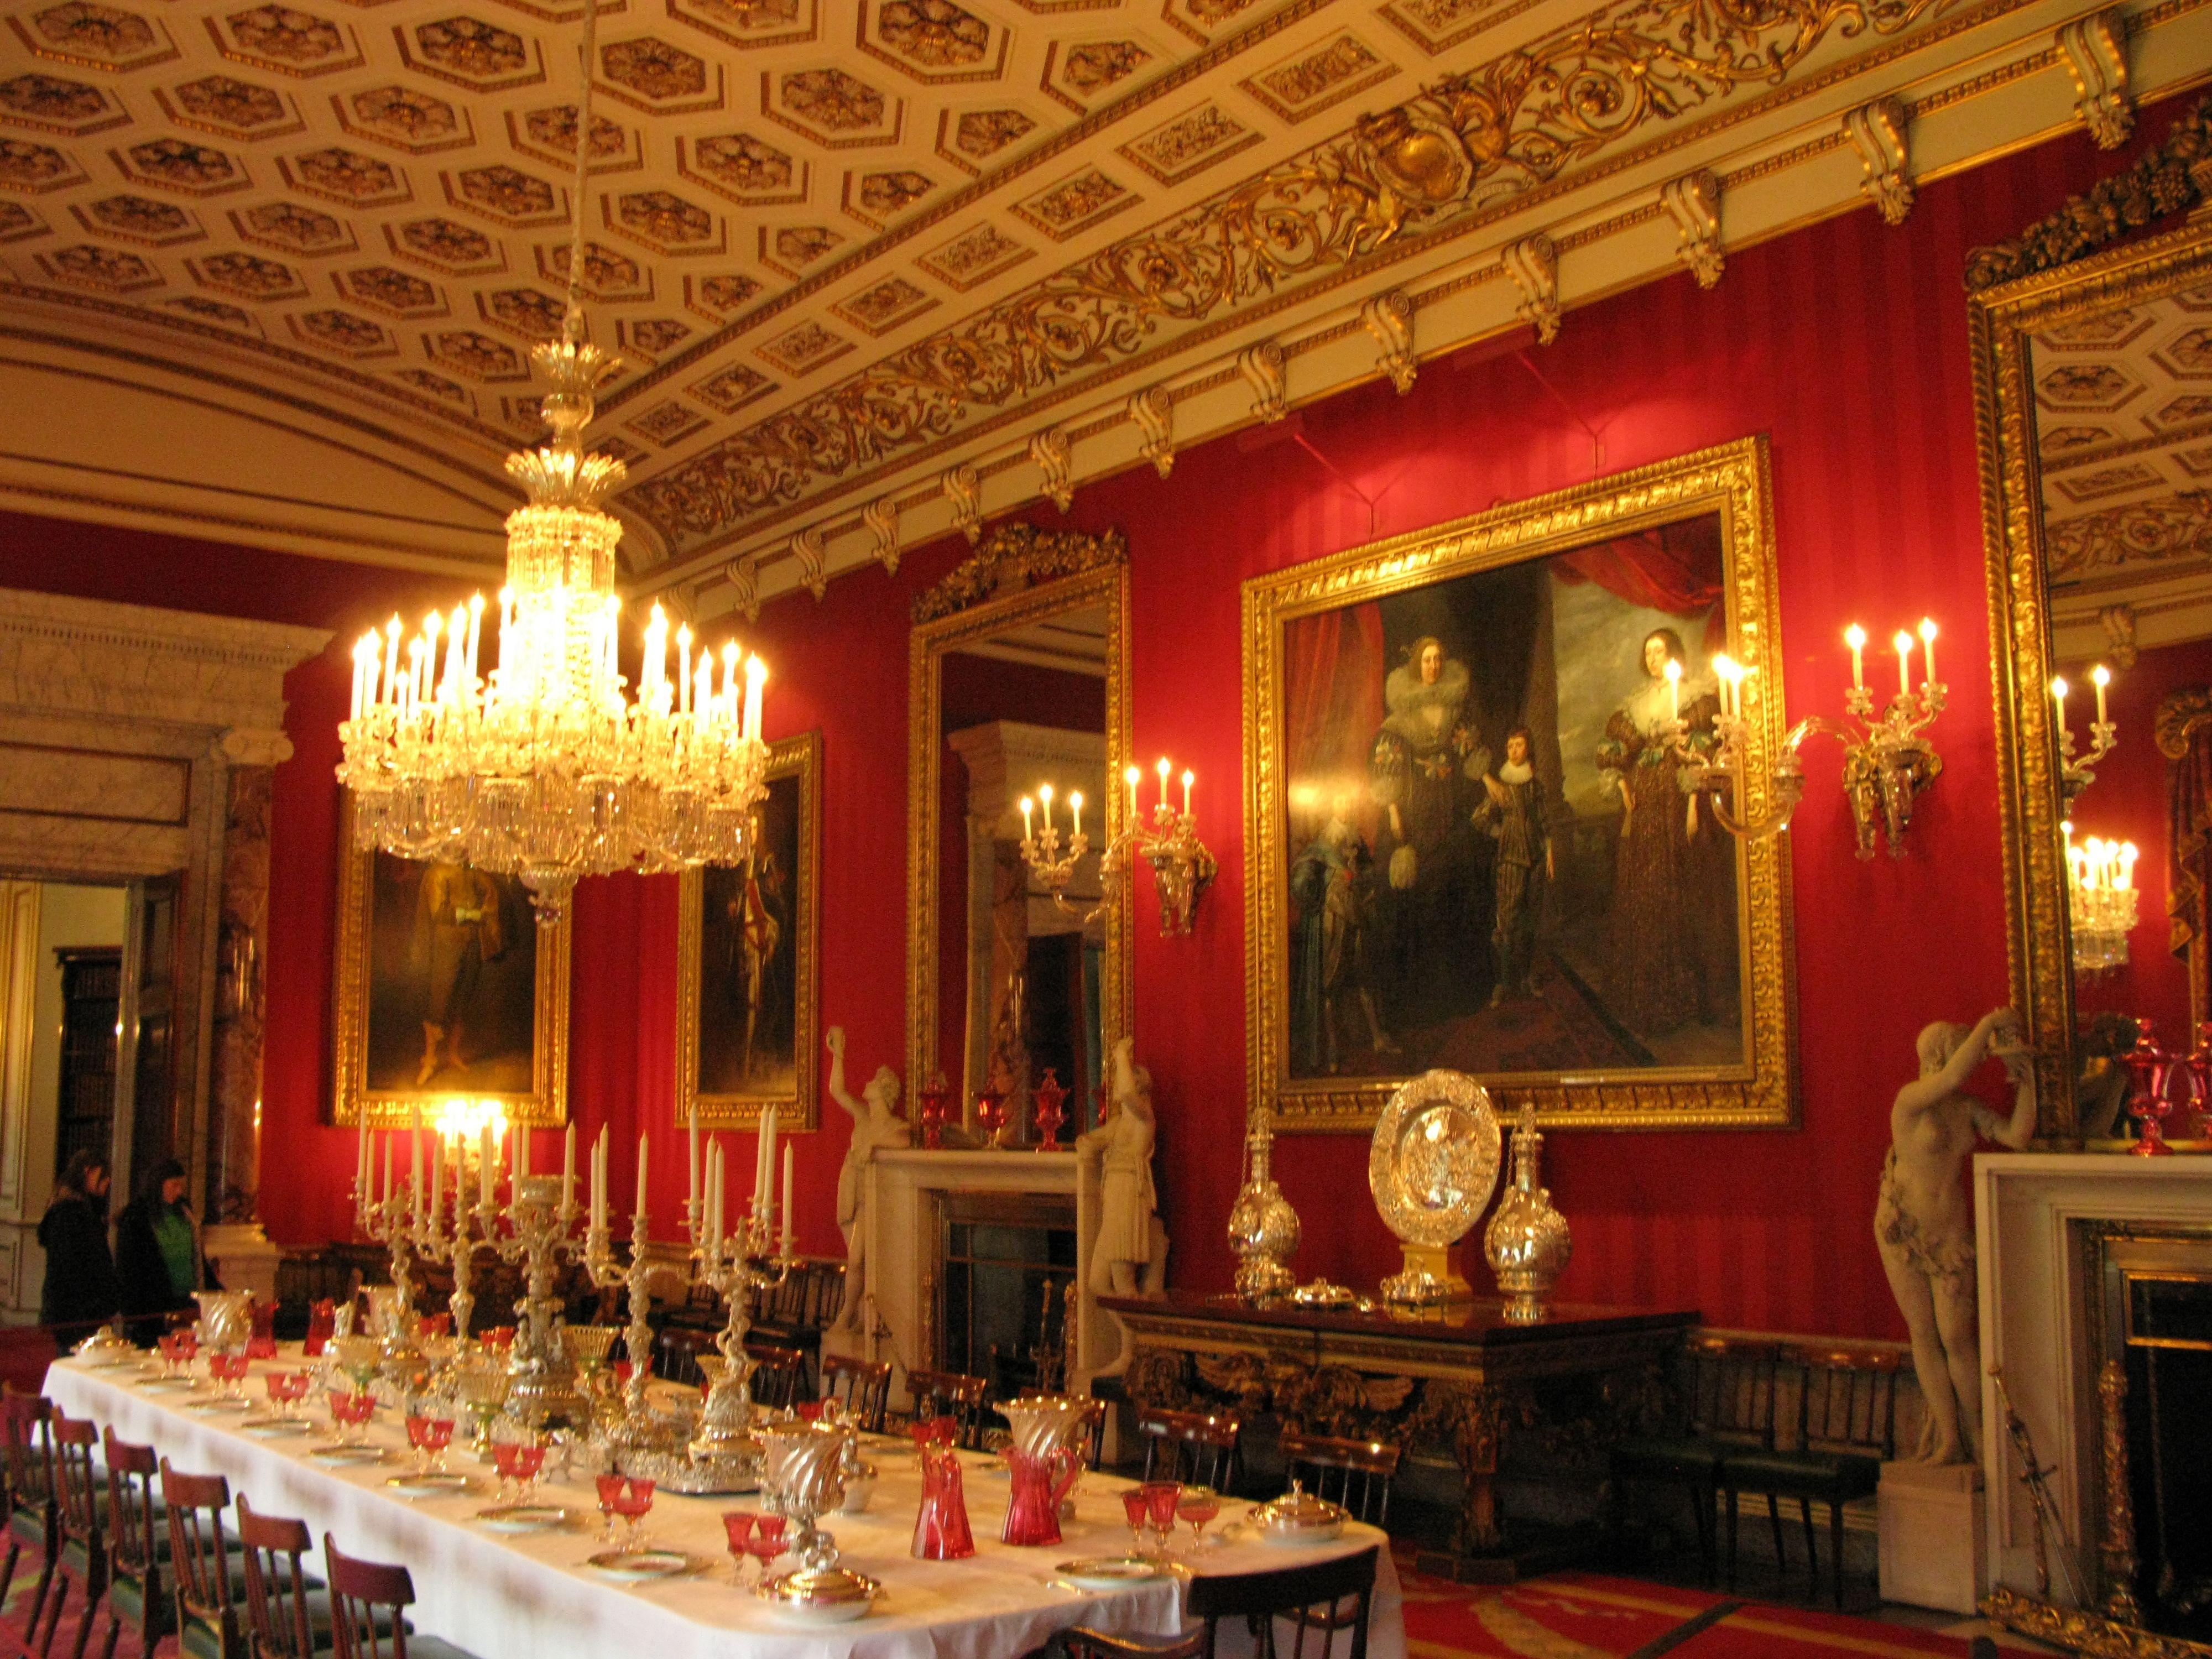 Chatsworth House interior furniture design rooms \